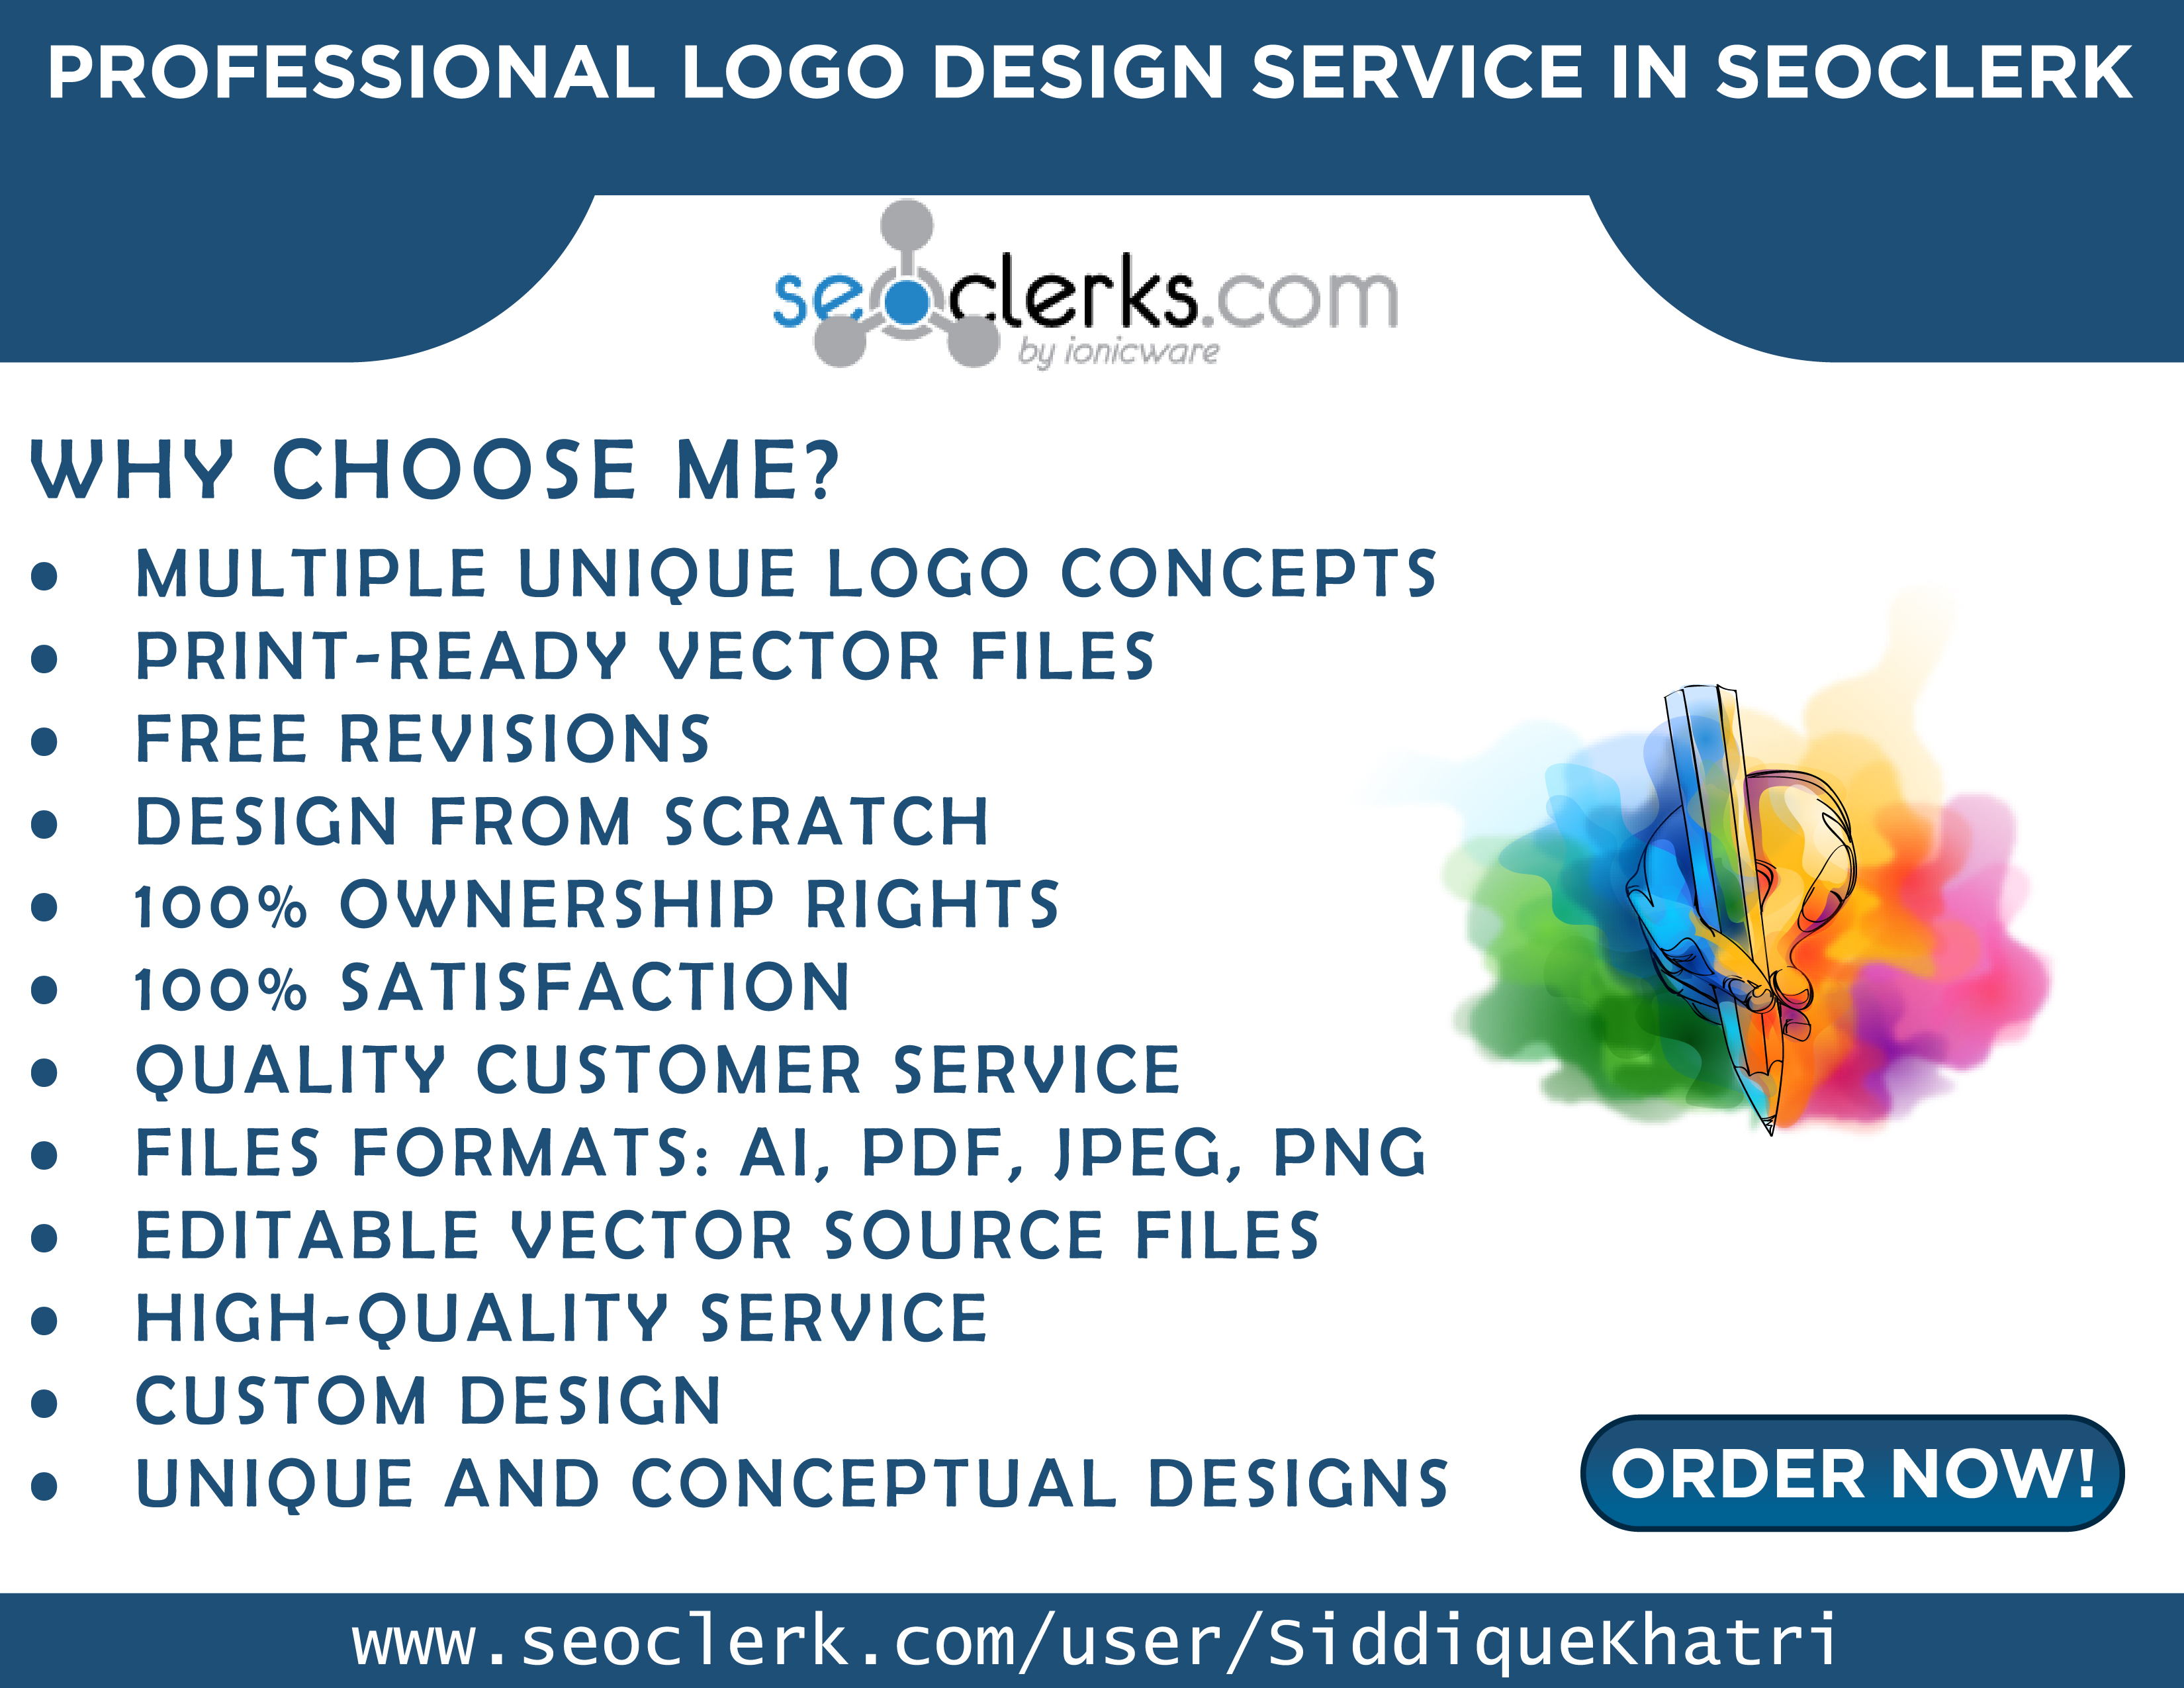 I will be your creative logo designer